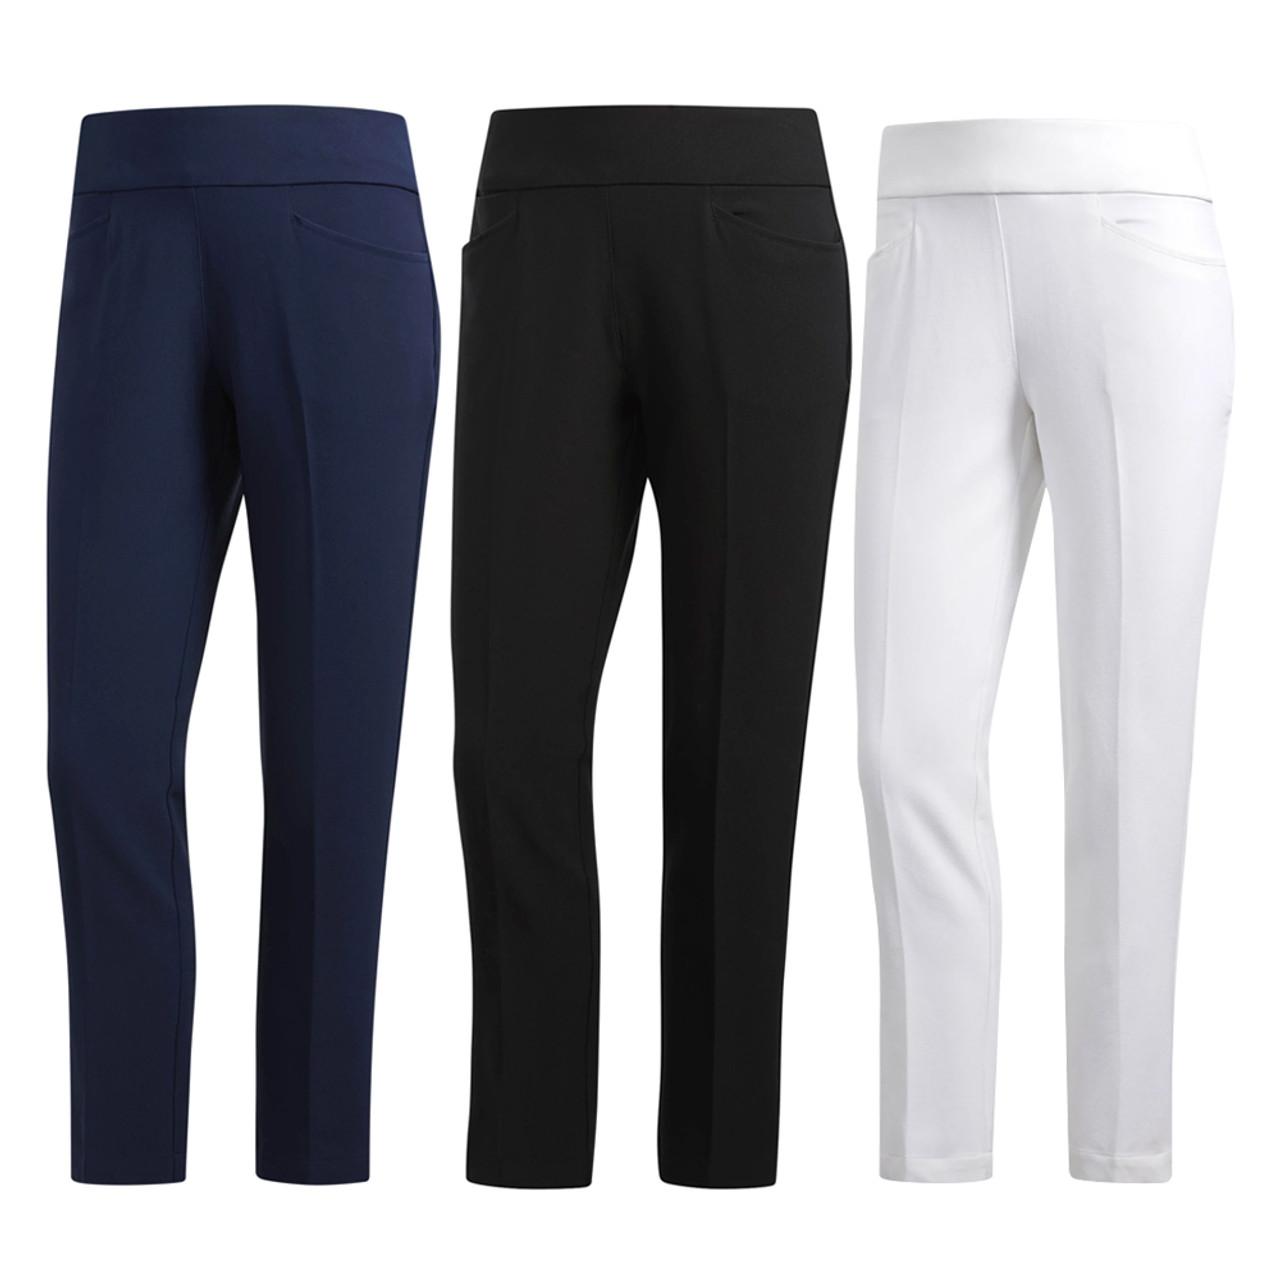 adidas pants 2019